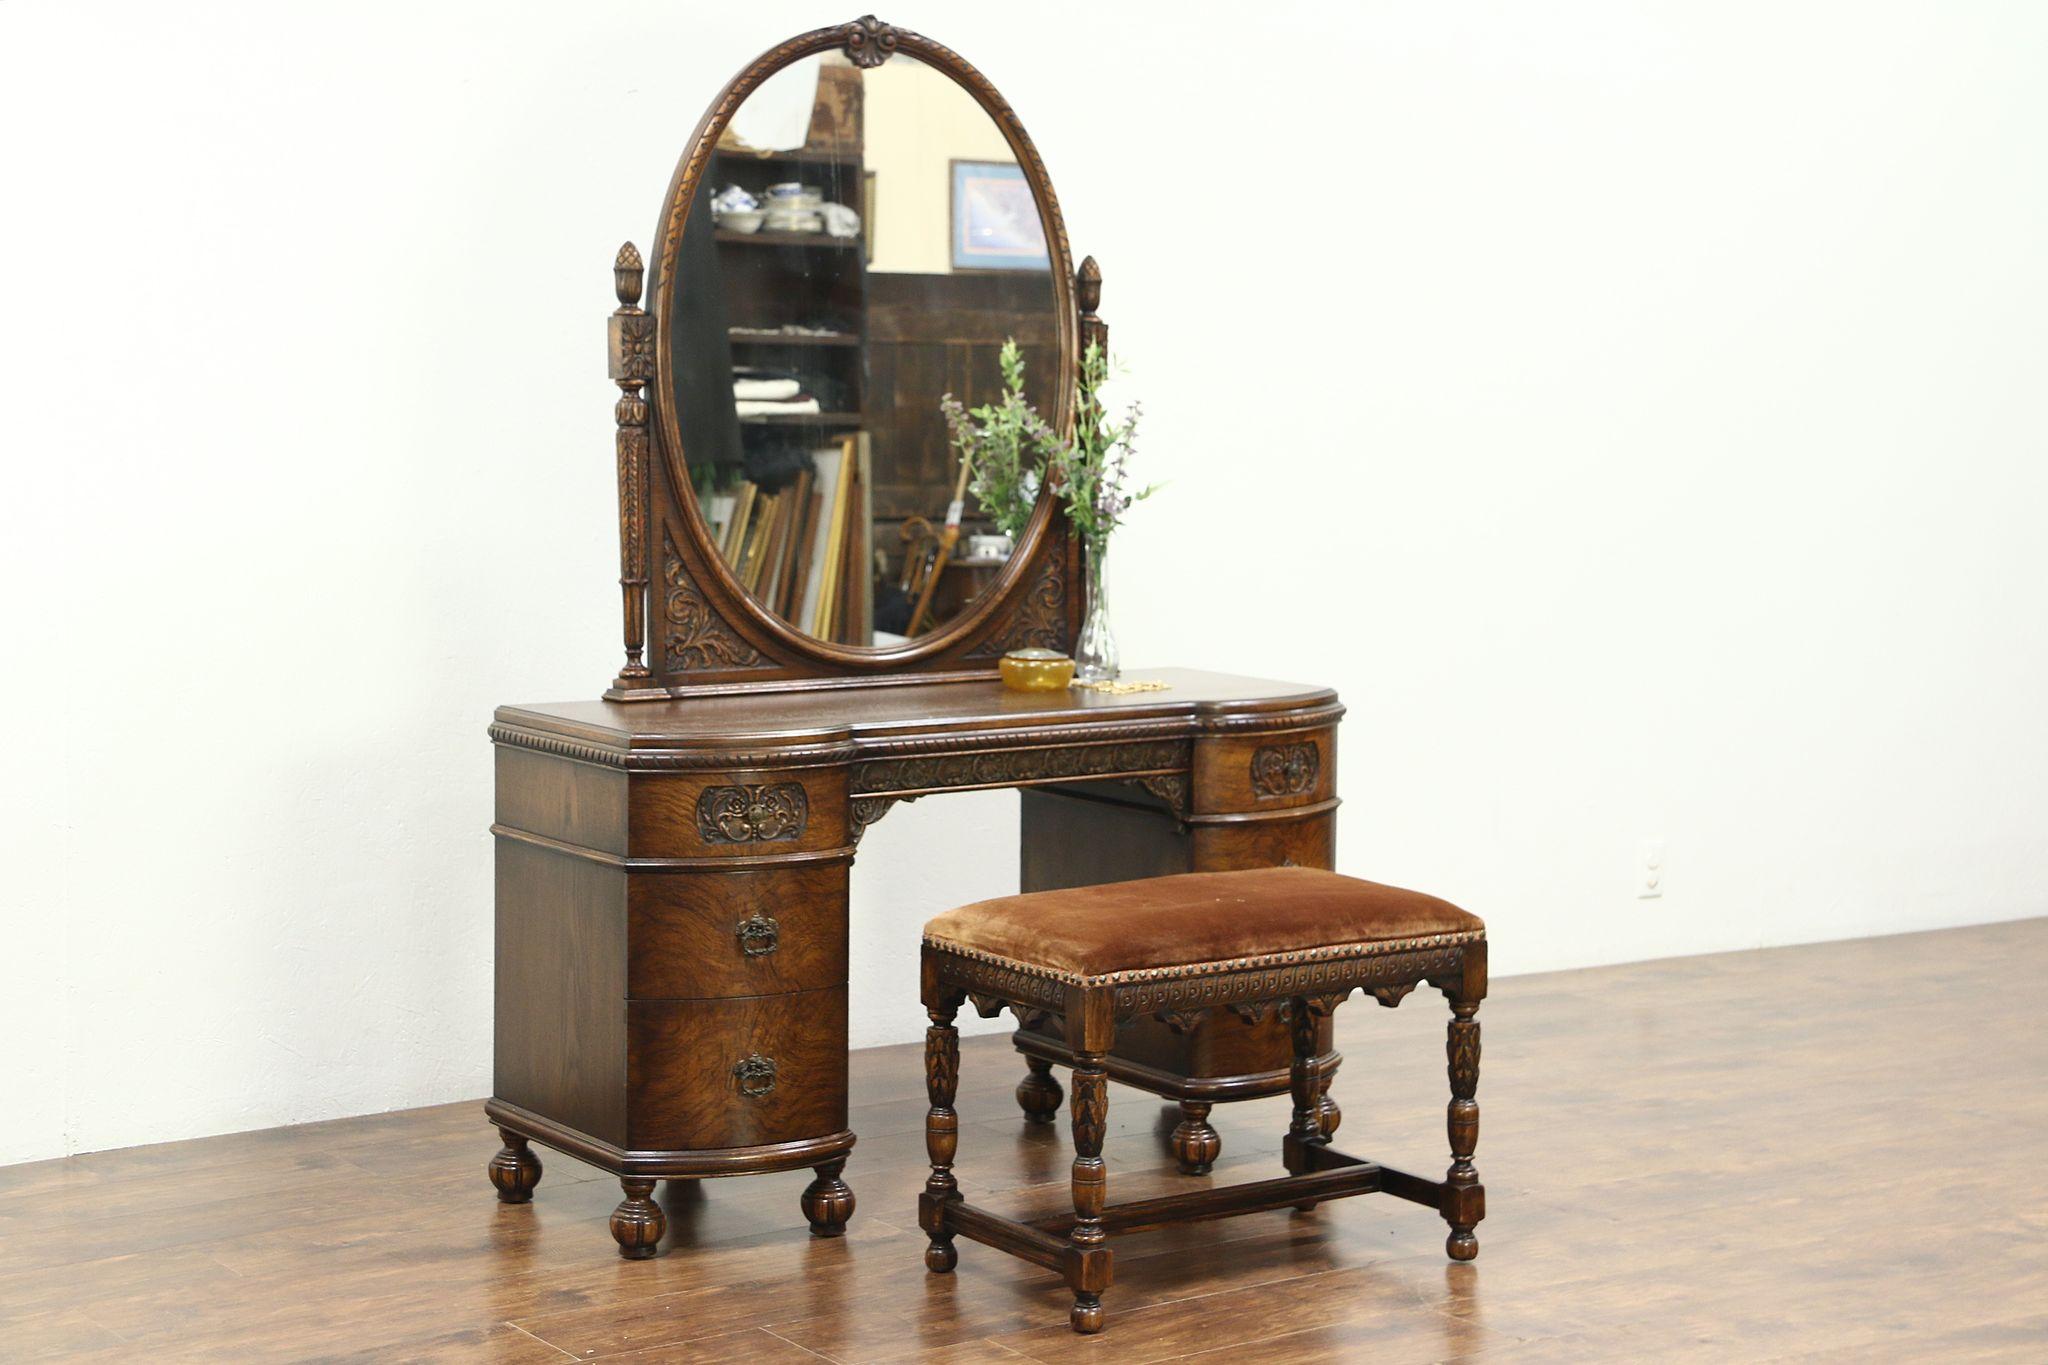 Super Vanity Or Dressing Table Vintage Mirror Bench Signed Romweber 28802 Ibusinesslaw Wood Chair Design Ideas Ibusinesslaworg